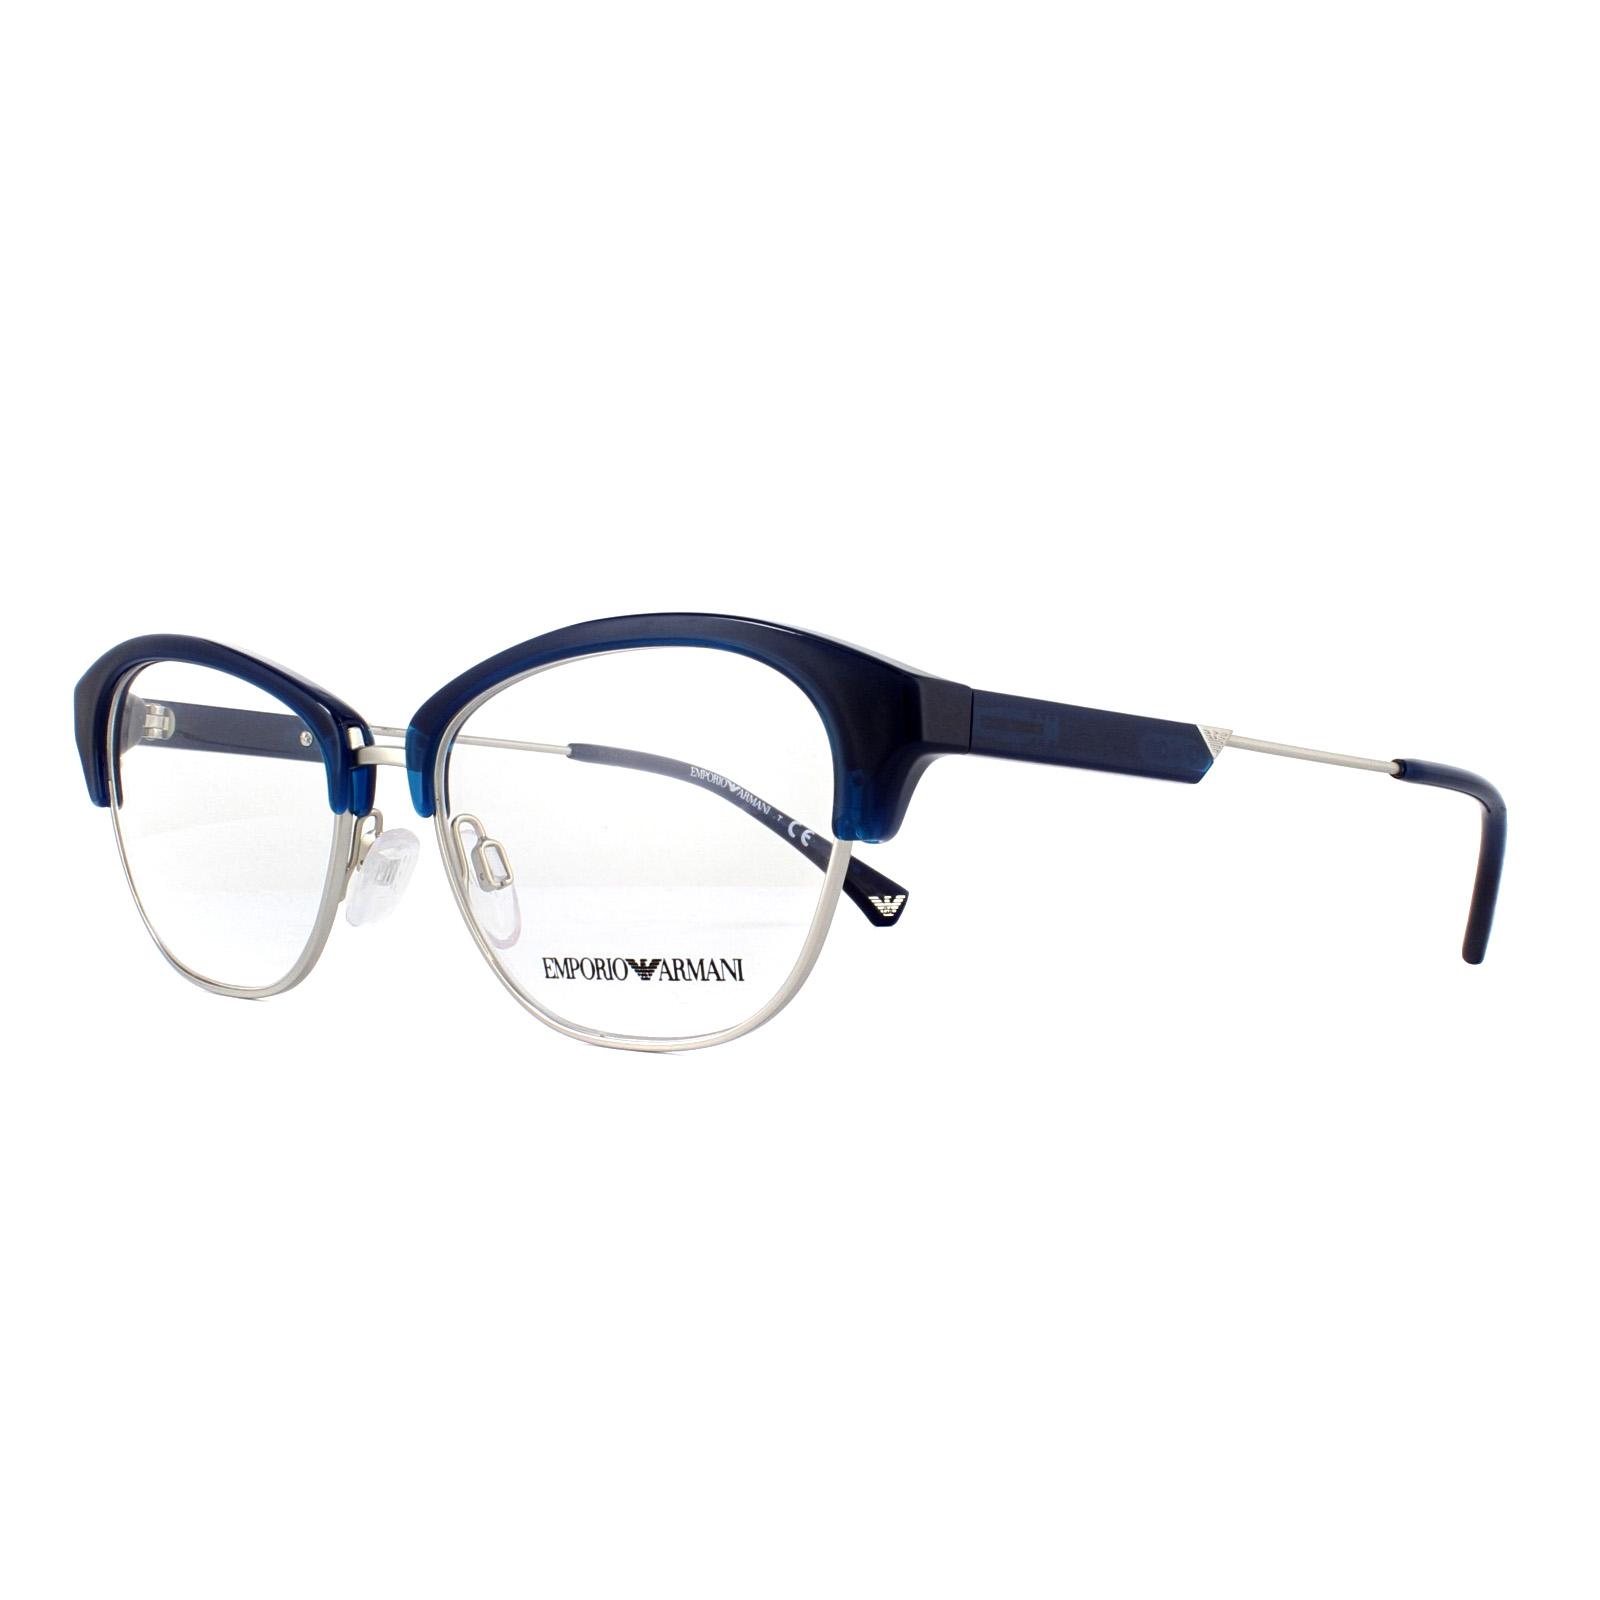 b88a0dbdd580 Sentinel Emporio Armani Glasses Frames EA 3115 5612 Blue and Silver 52mm  Womens